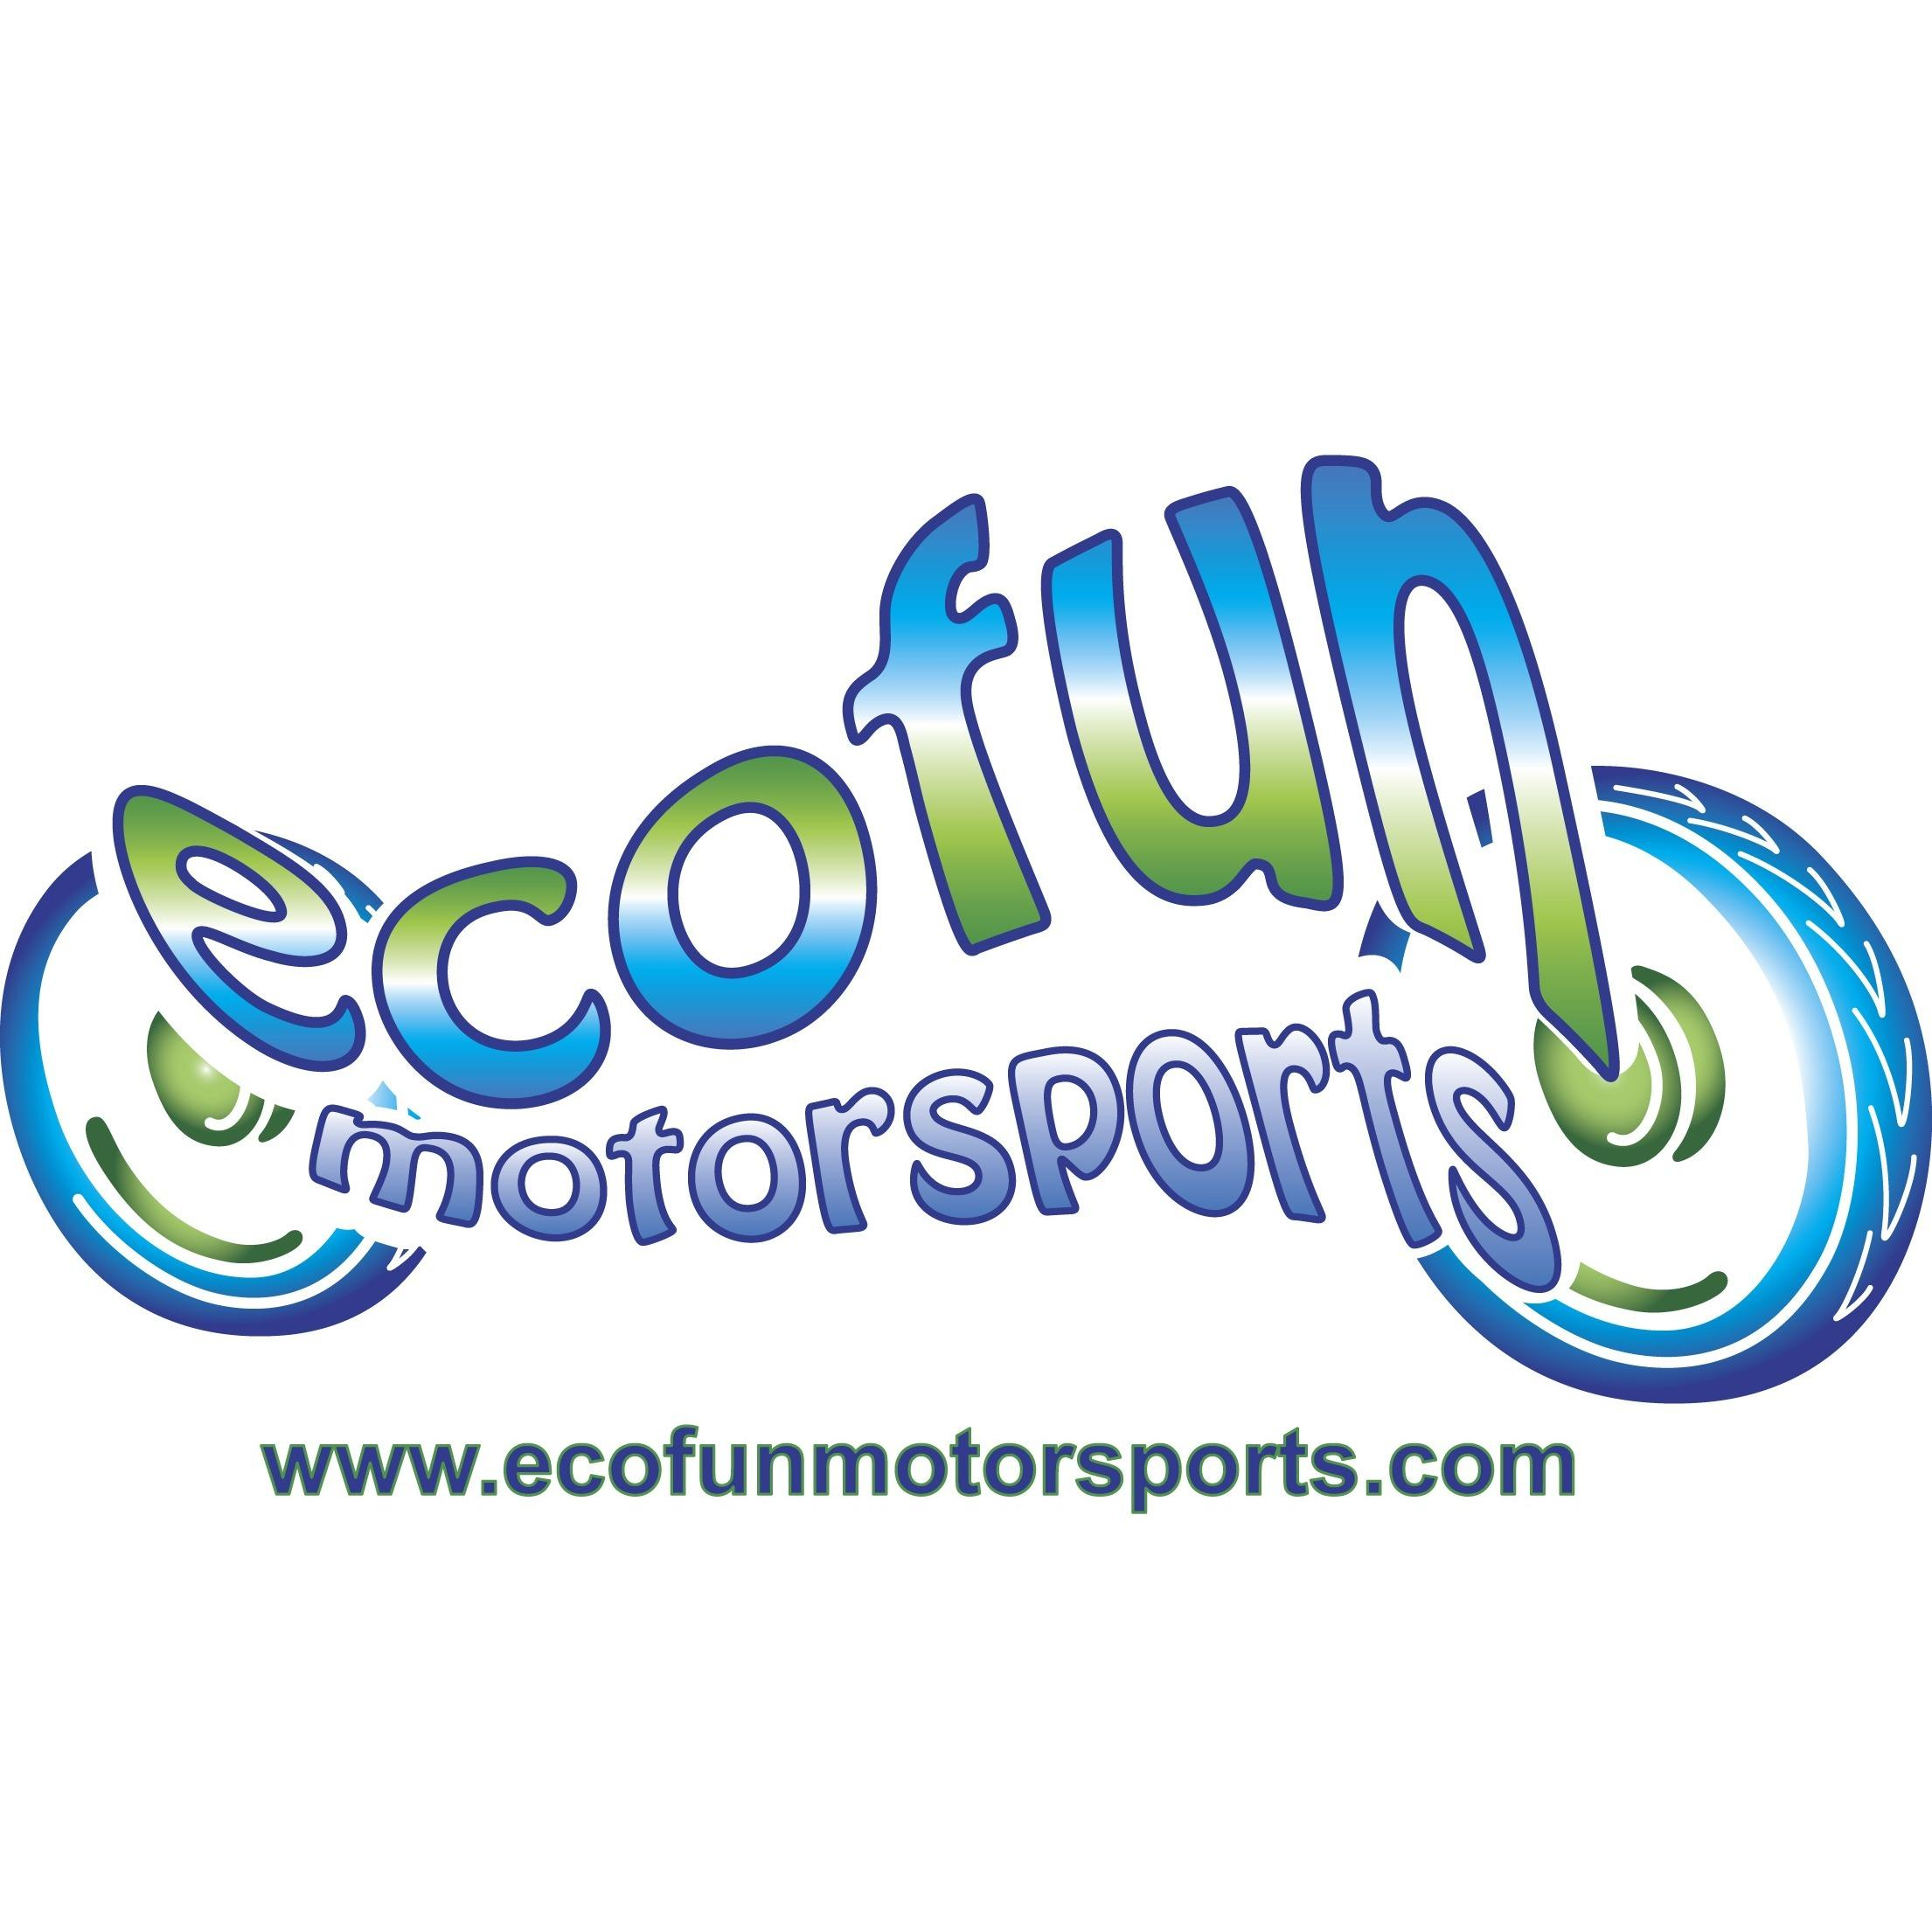 Ecofun Motorsports image 4